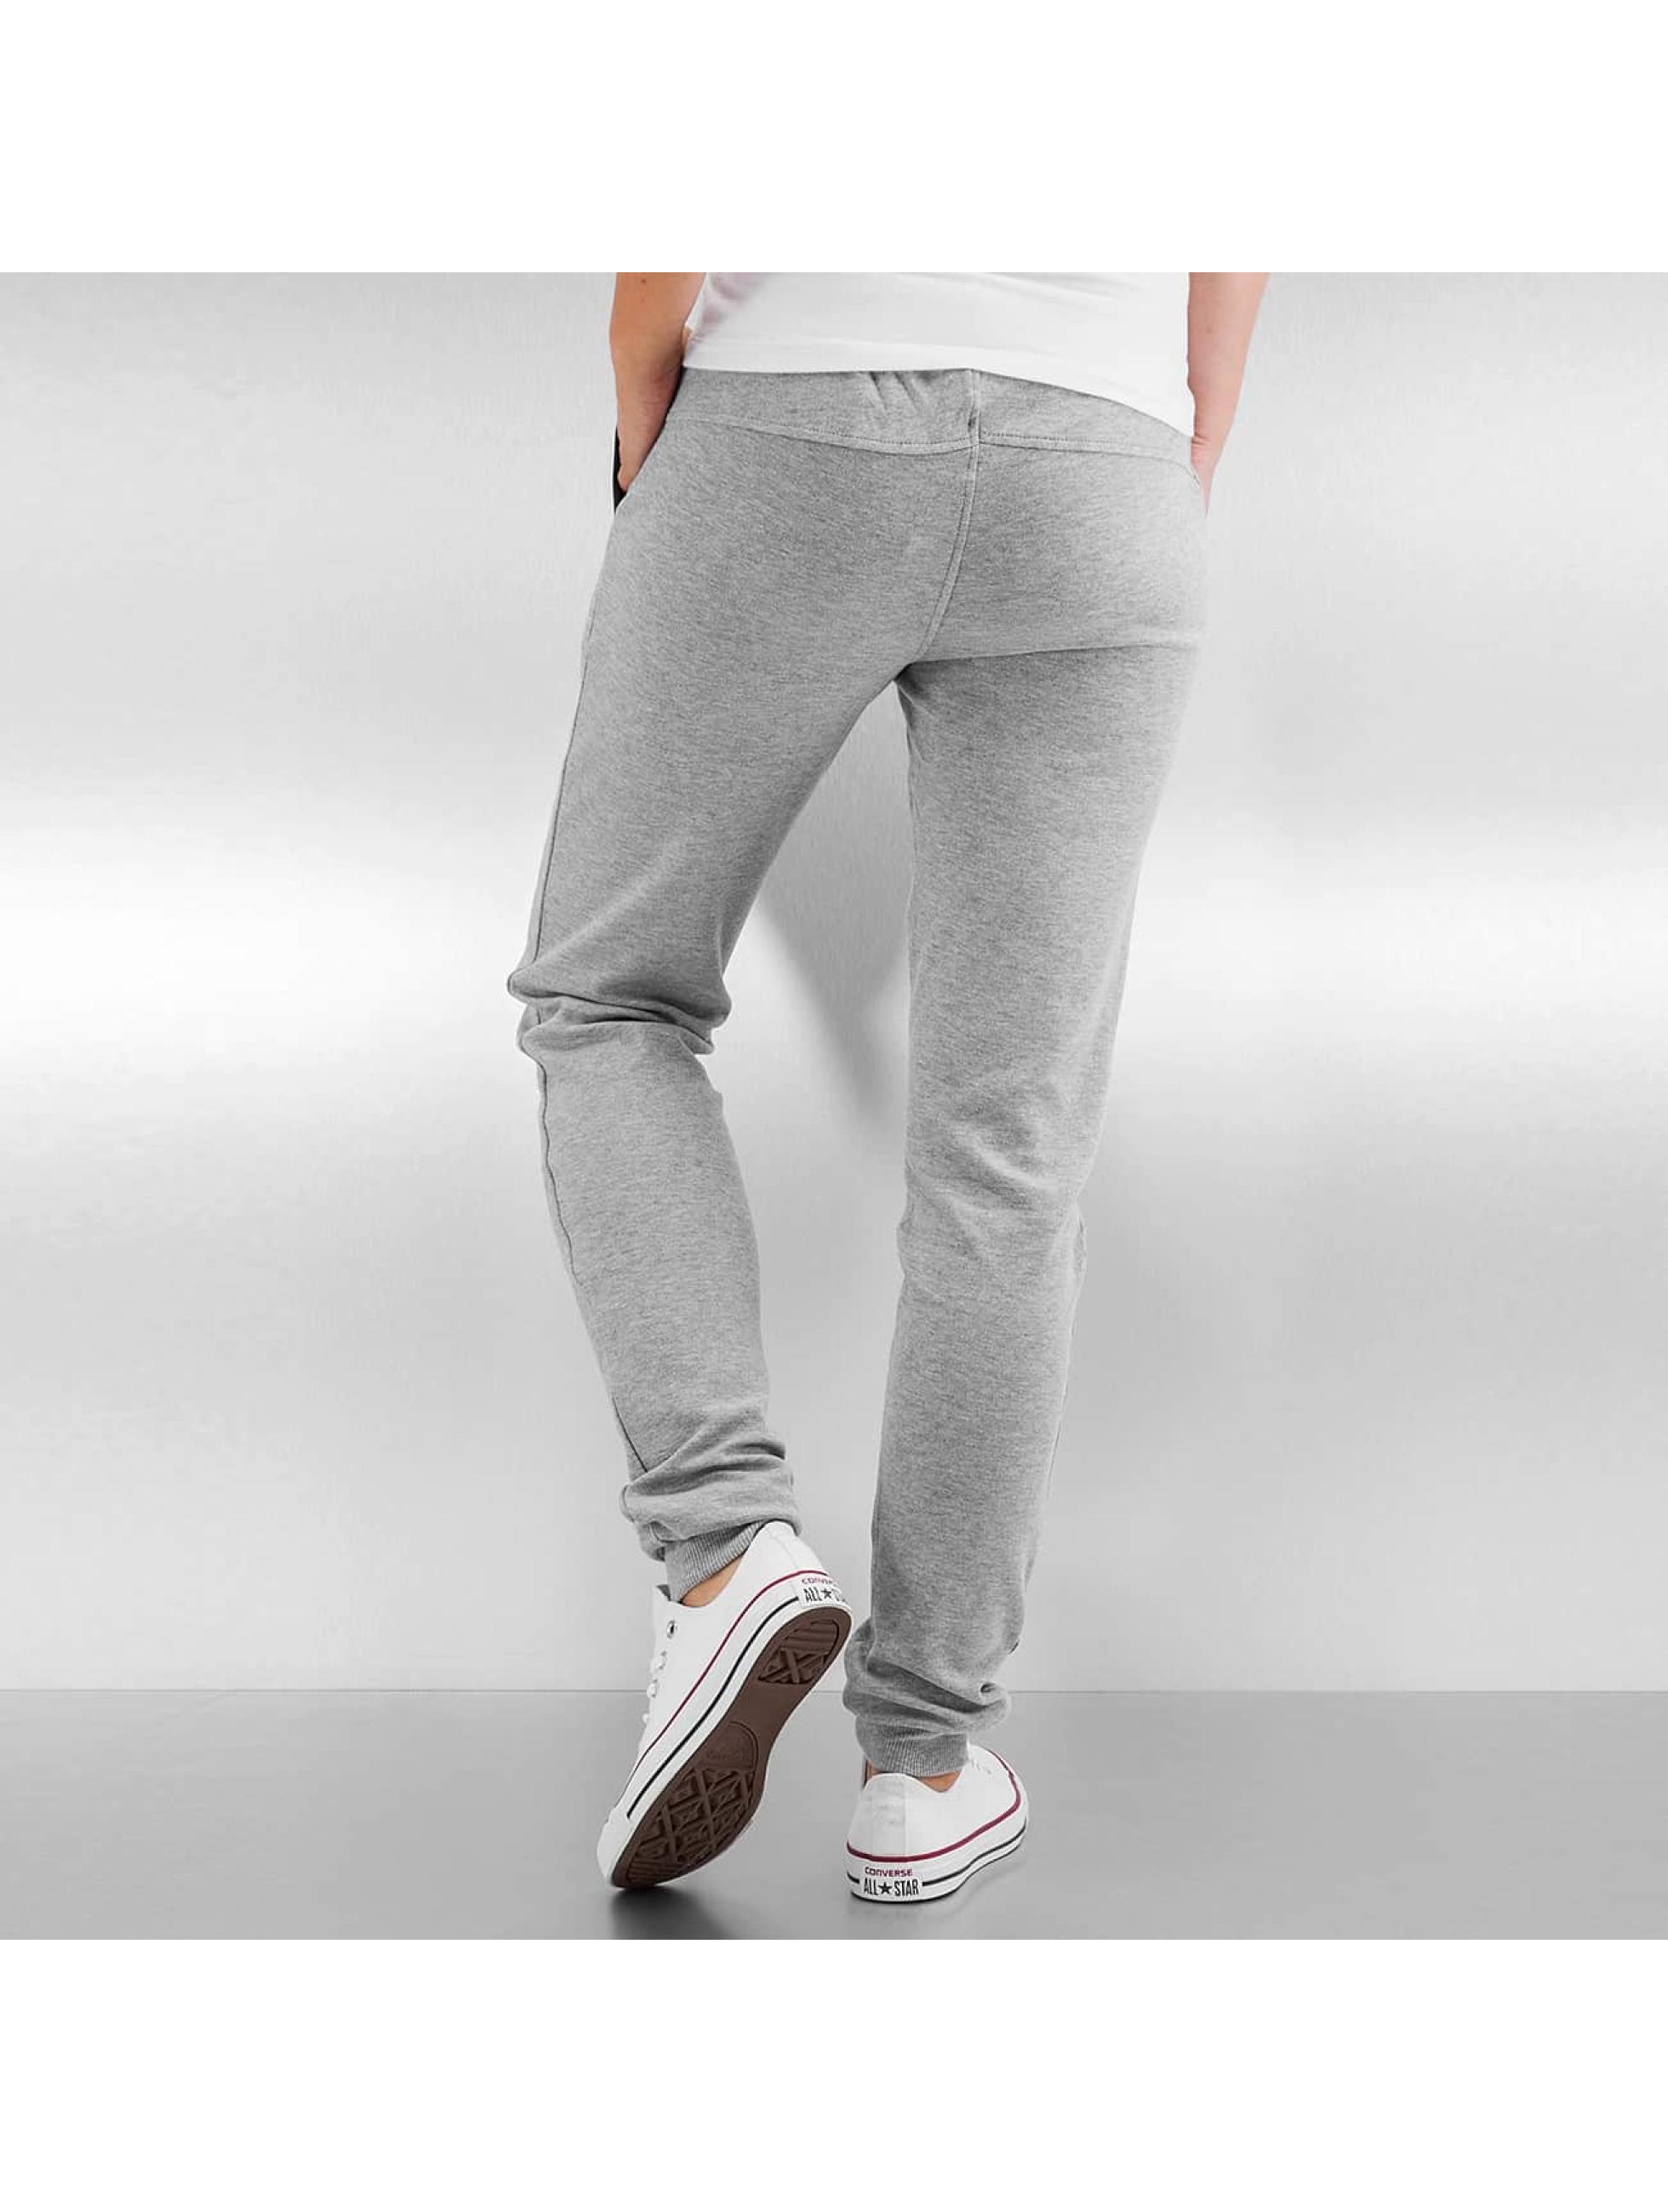 Urban Classics Спортивные брюки Fitted Athletic серый